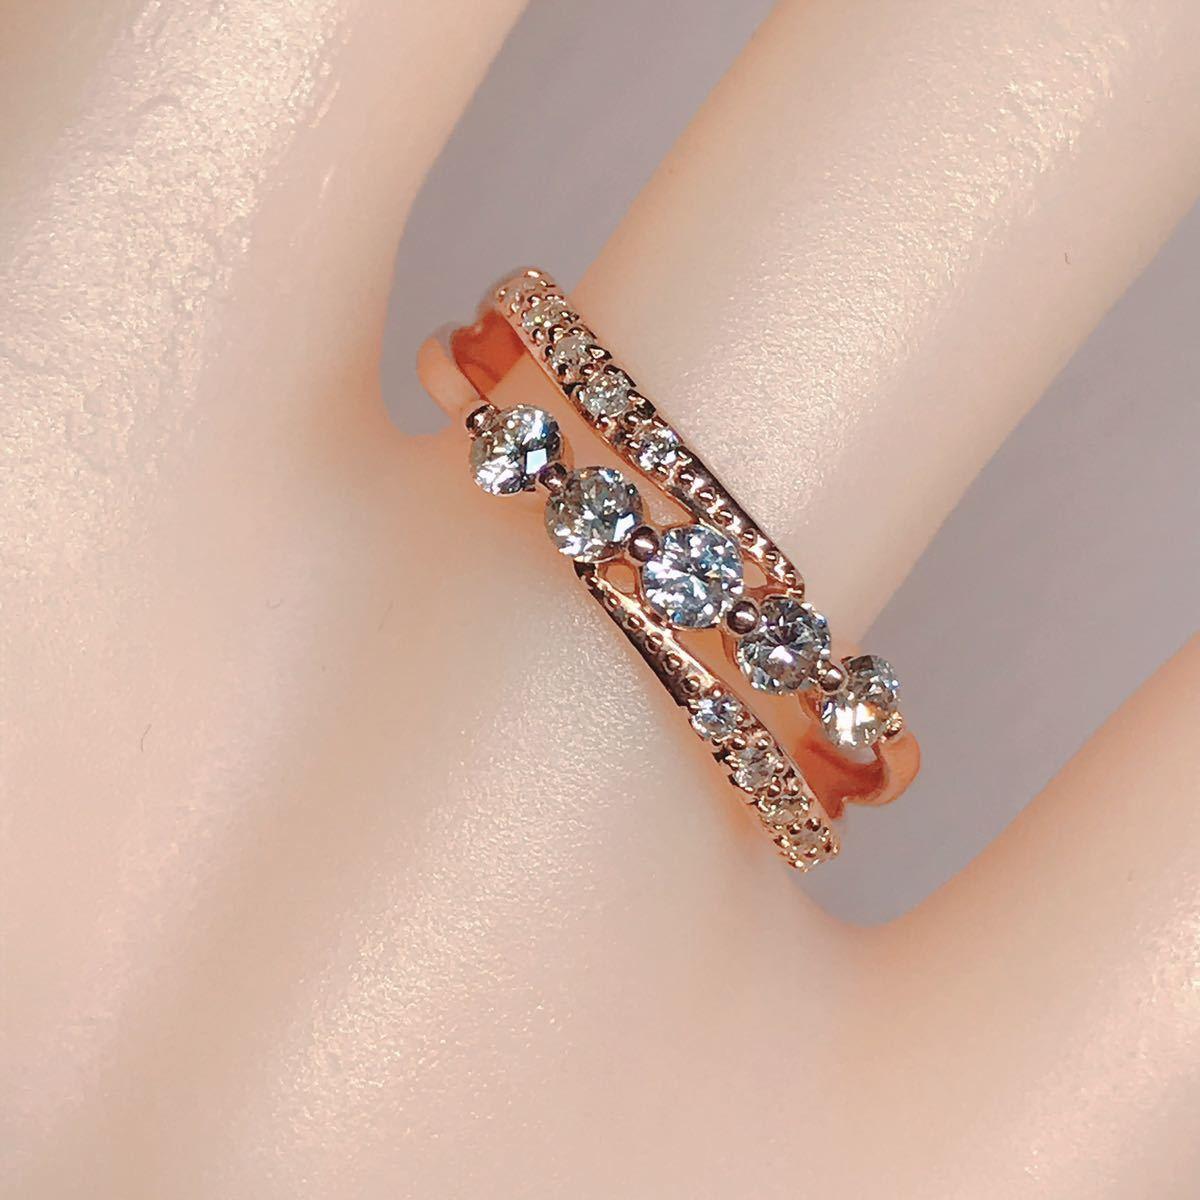 0.50ct ダイヤモンドリング K18 ダイヤ ウェーブ ミル打ち 上品 幅広_画像8